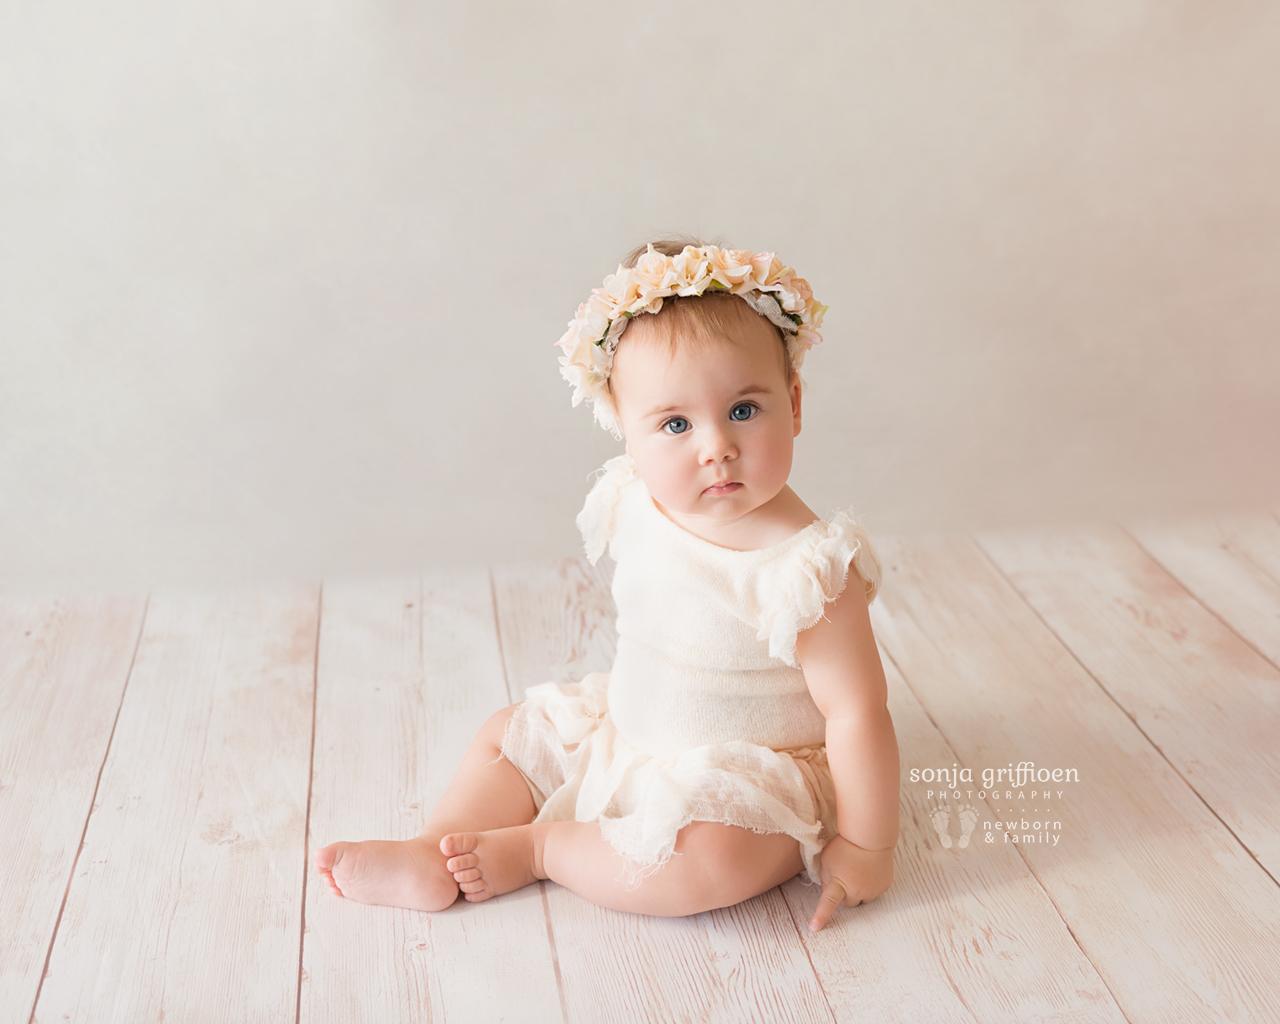 Thalia-Milestone-Brisbane-Newborn-Photographer-Sonja-Griffioen-01.jpg